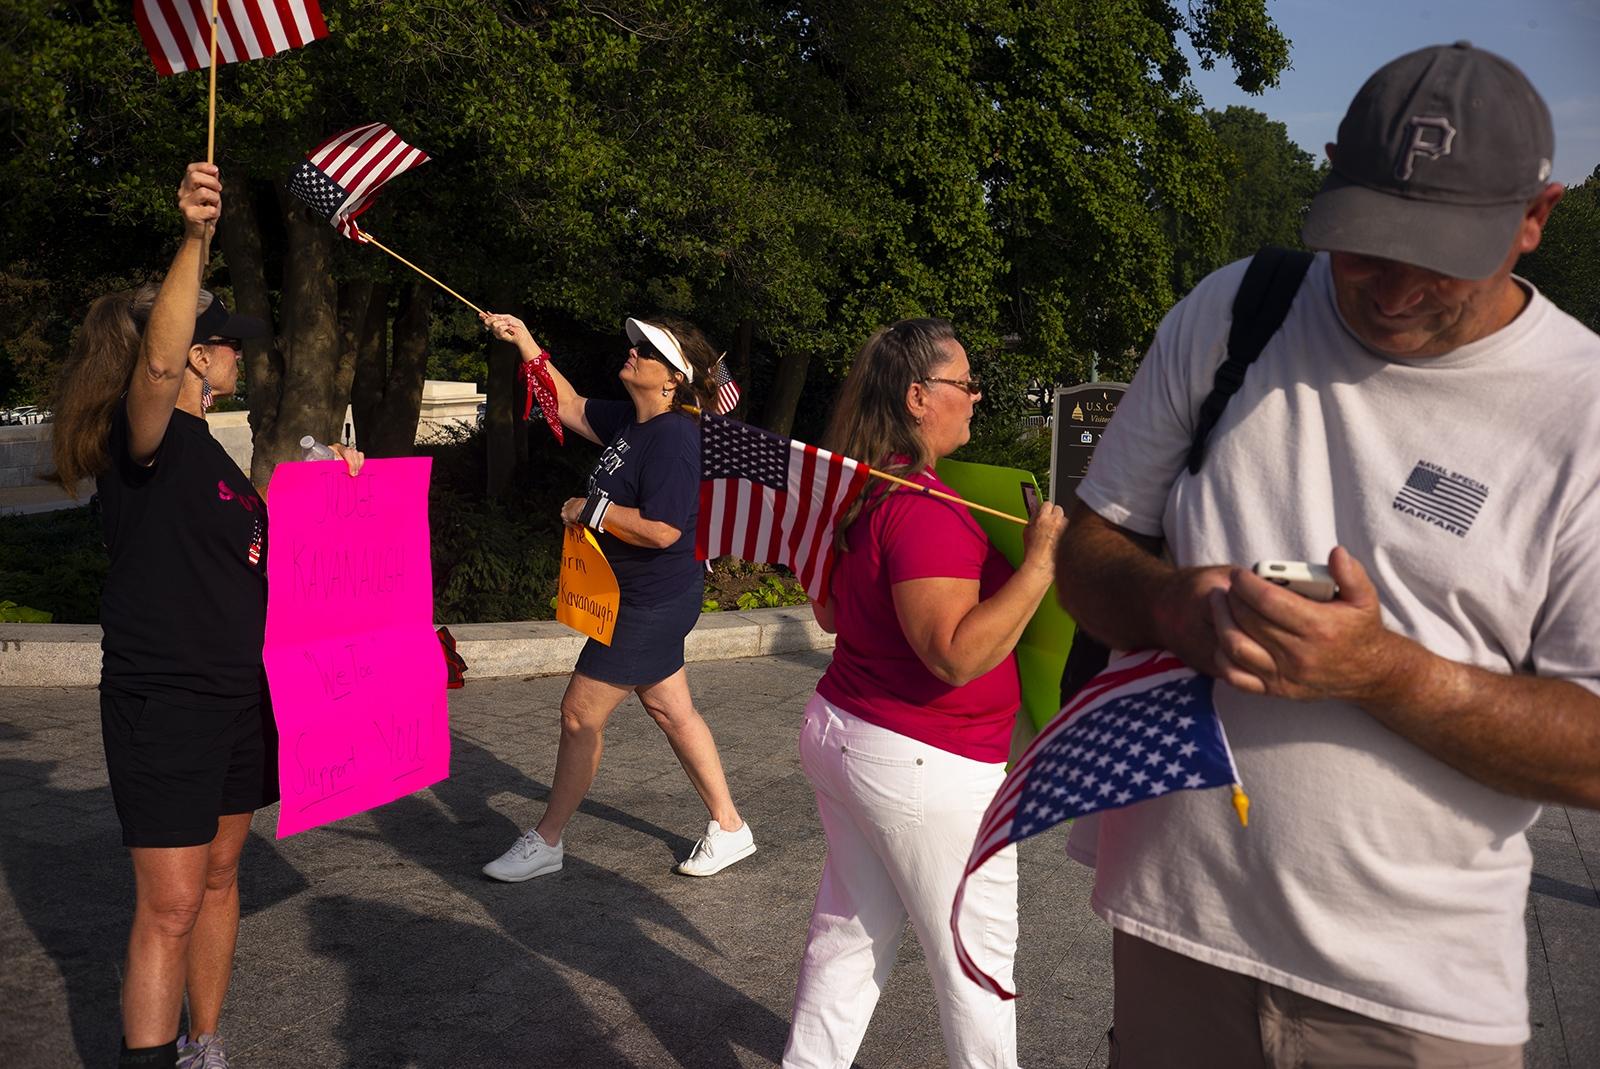 Pro Judge Kavanaugh protesters from Virginia Beach, VA on Capitol Hill.